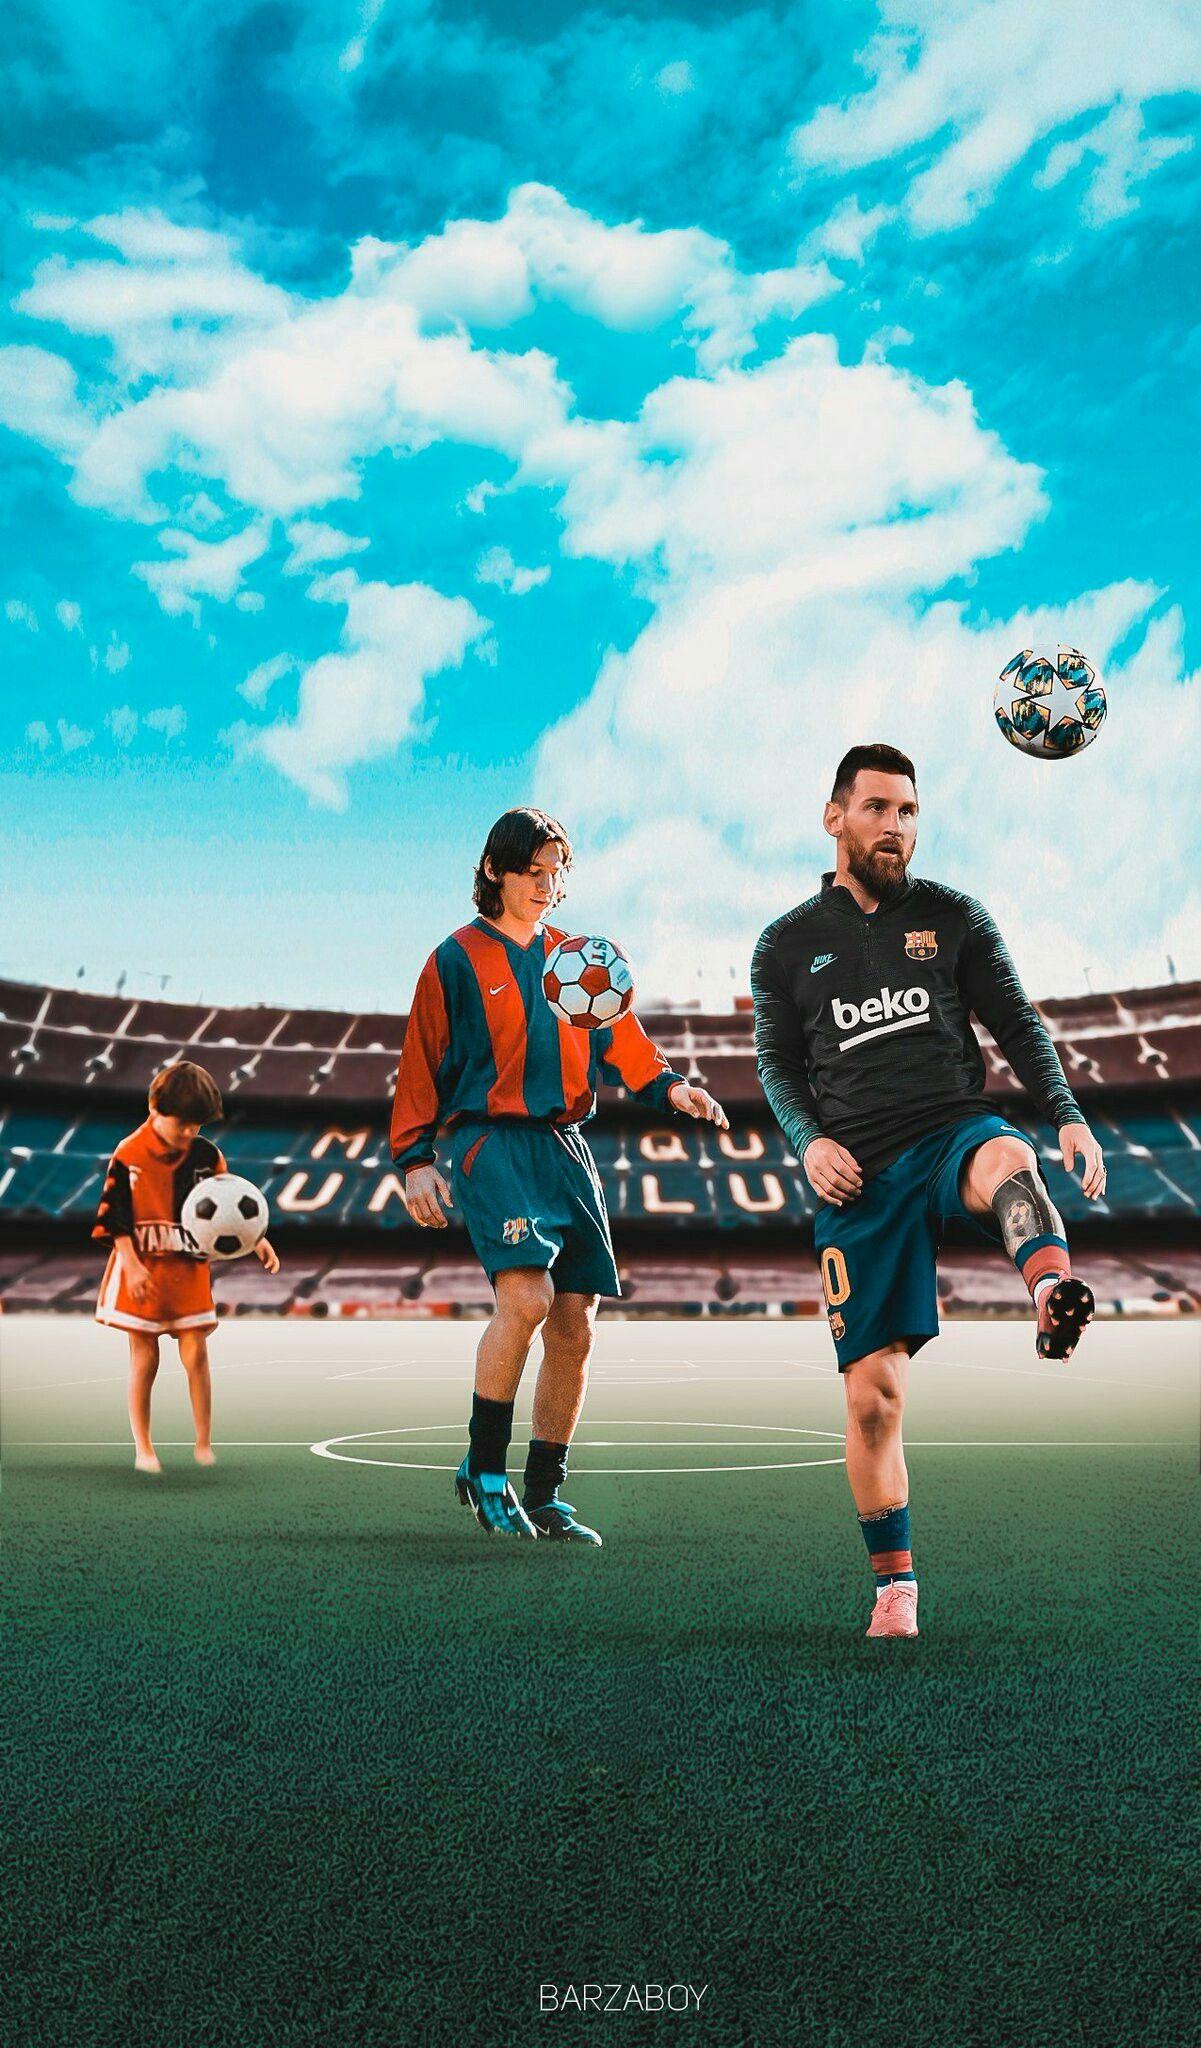 Lionel messi evolution   Fotos de messi, Dibujos de futbol ...